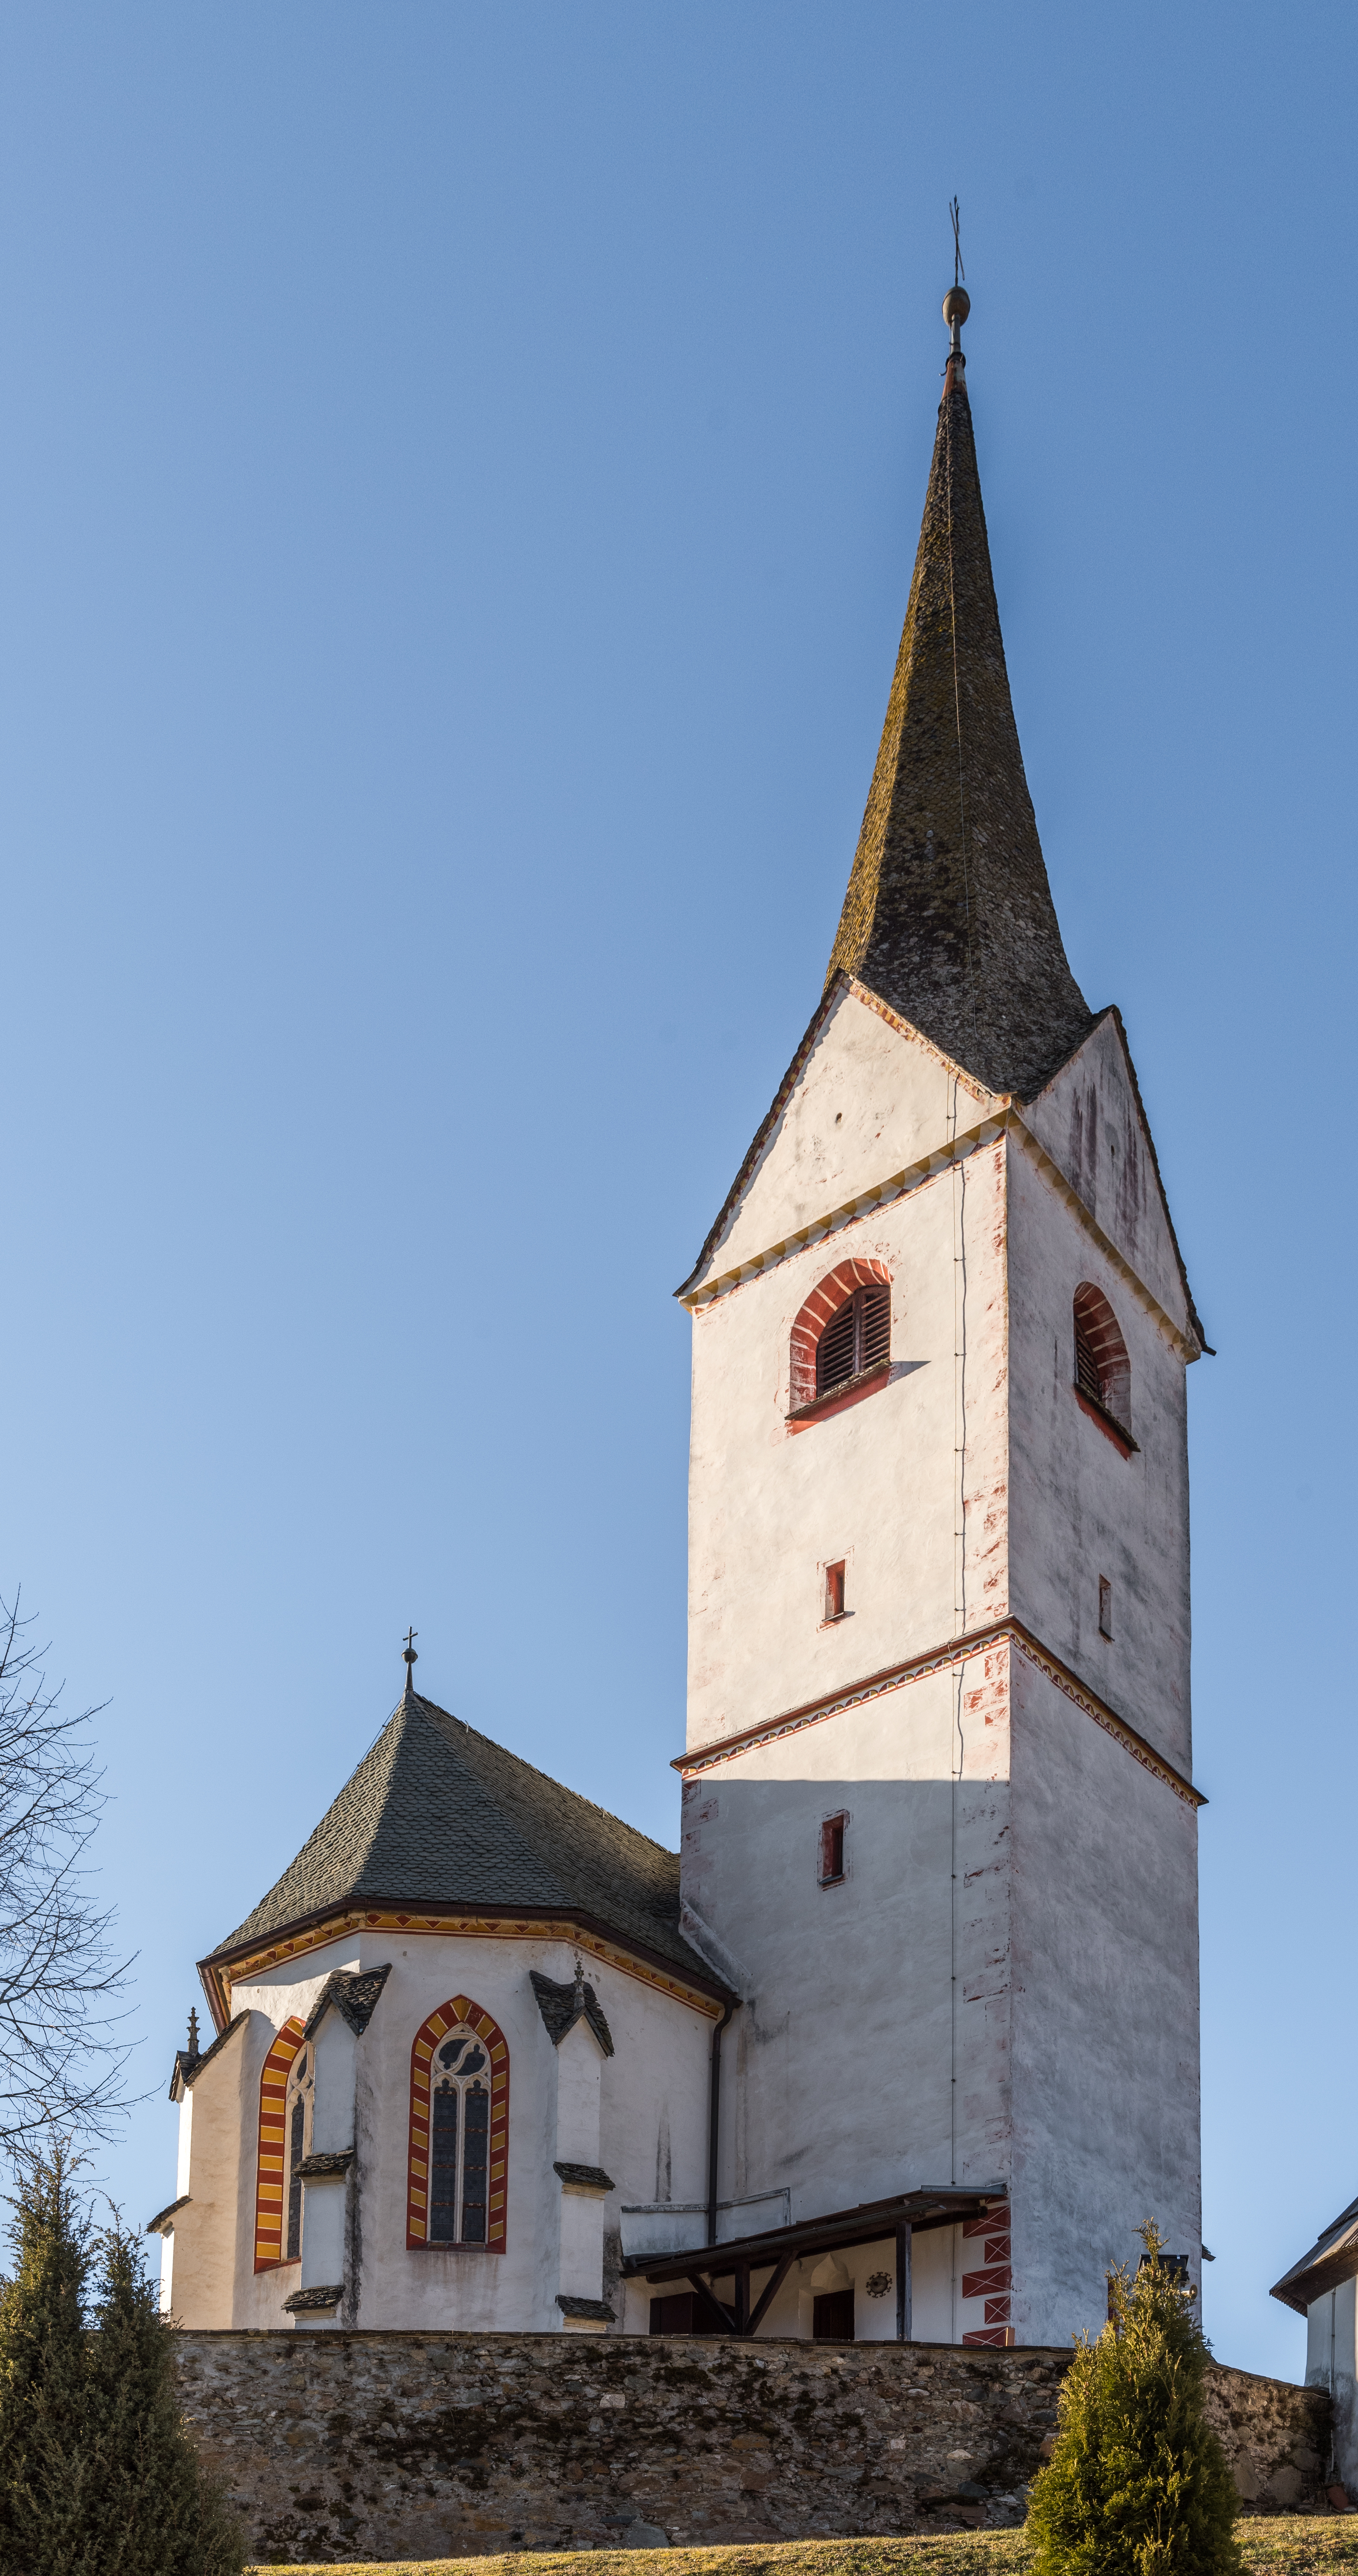 File:Poggersdorf Pfarrkirche hll. Georg und Jakobus major S